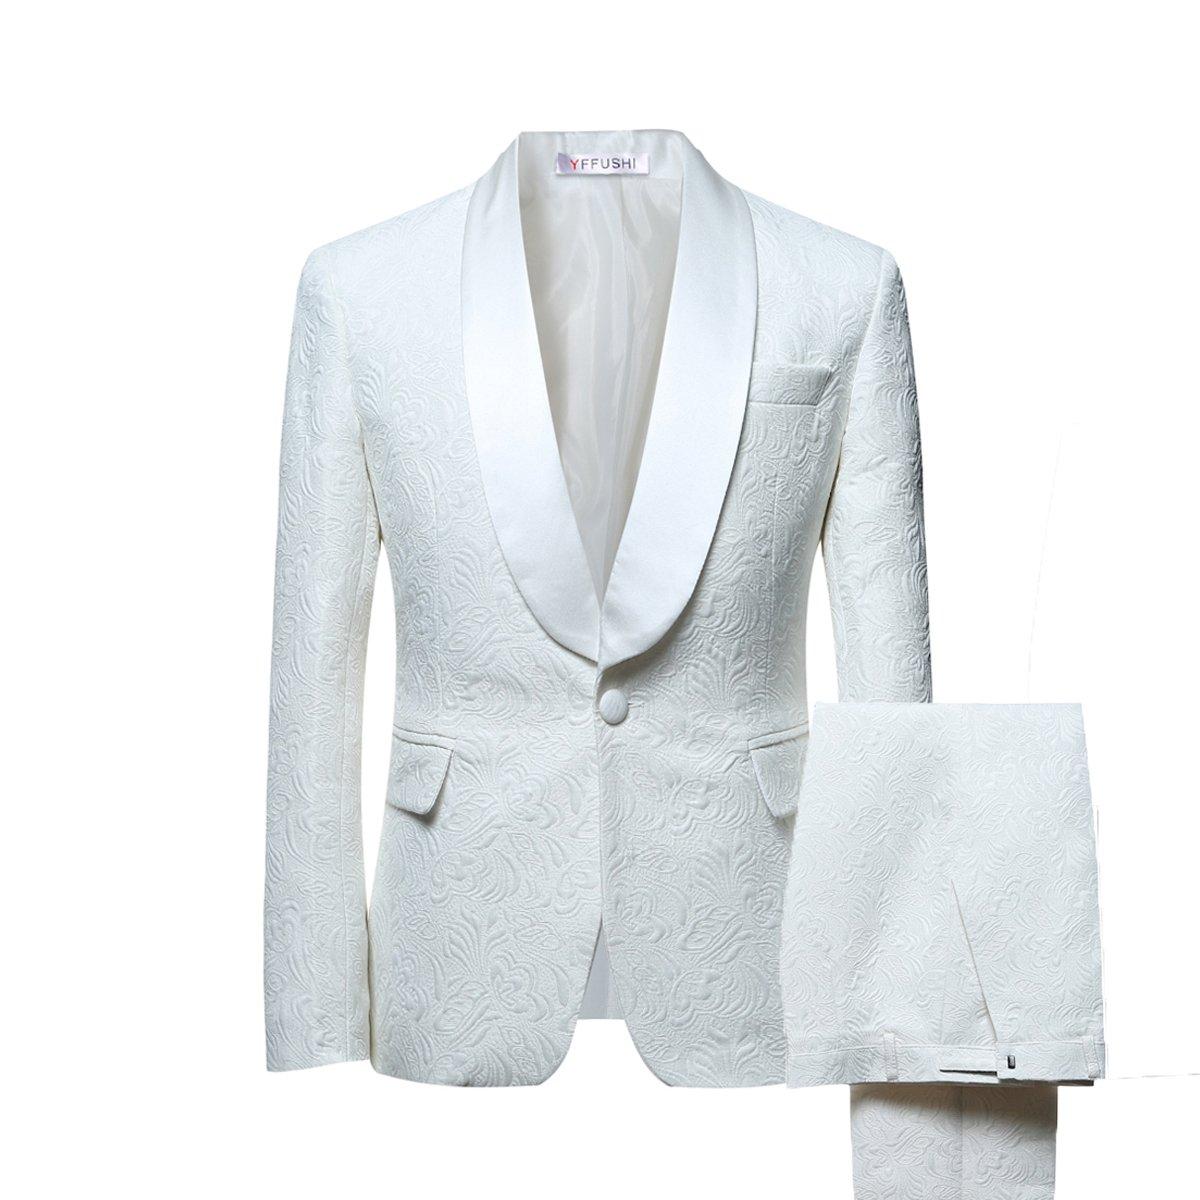 Amazon.com: YFFUSHI - Vestido para hombre, 1 botón, 2 piezas ...